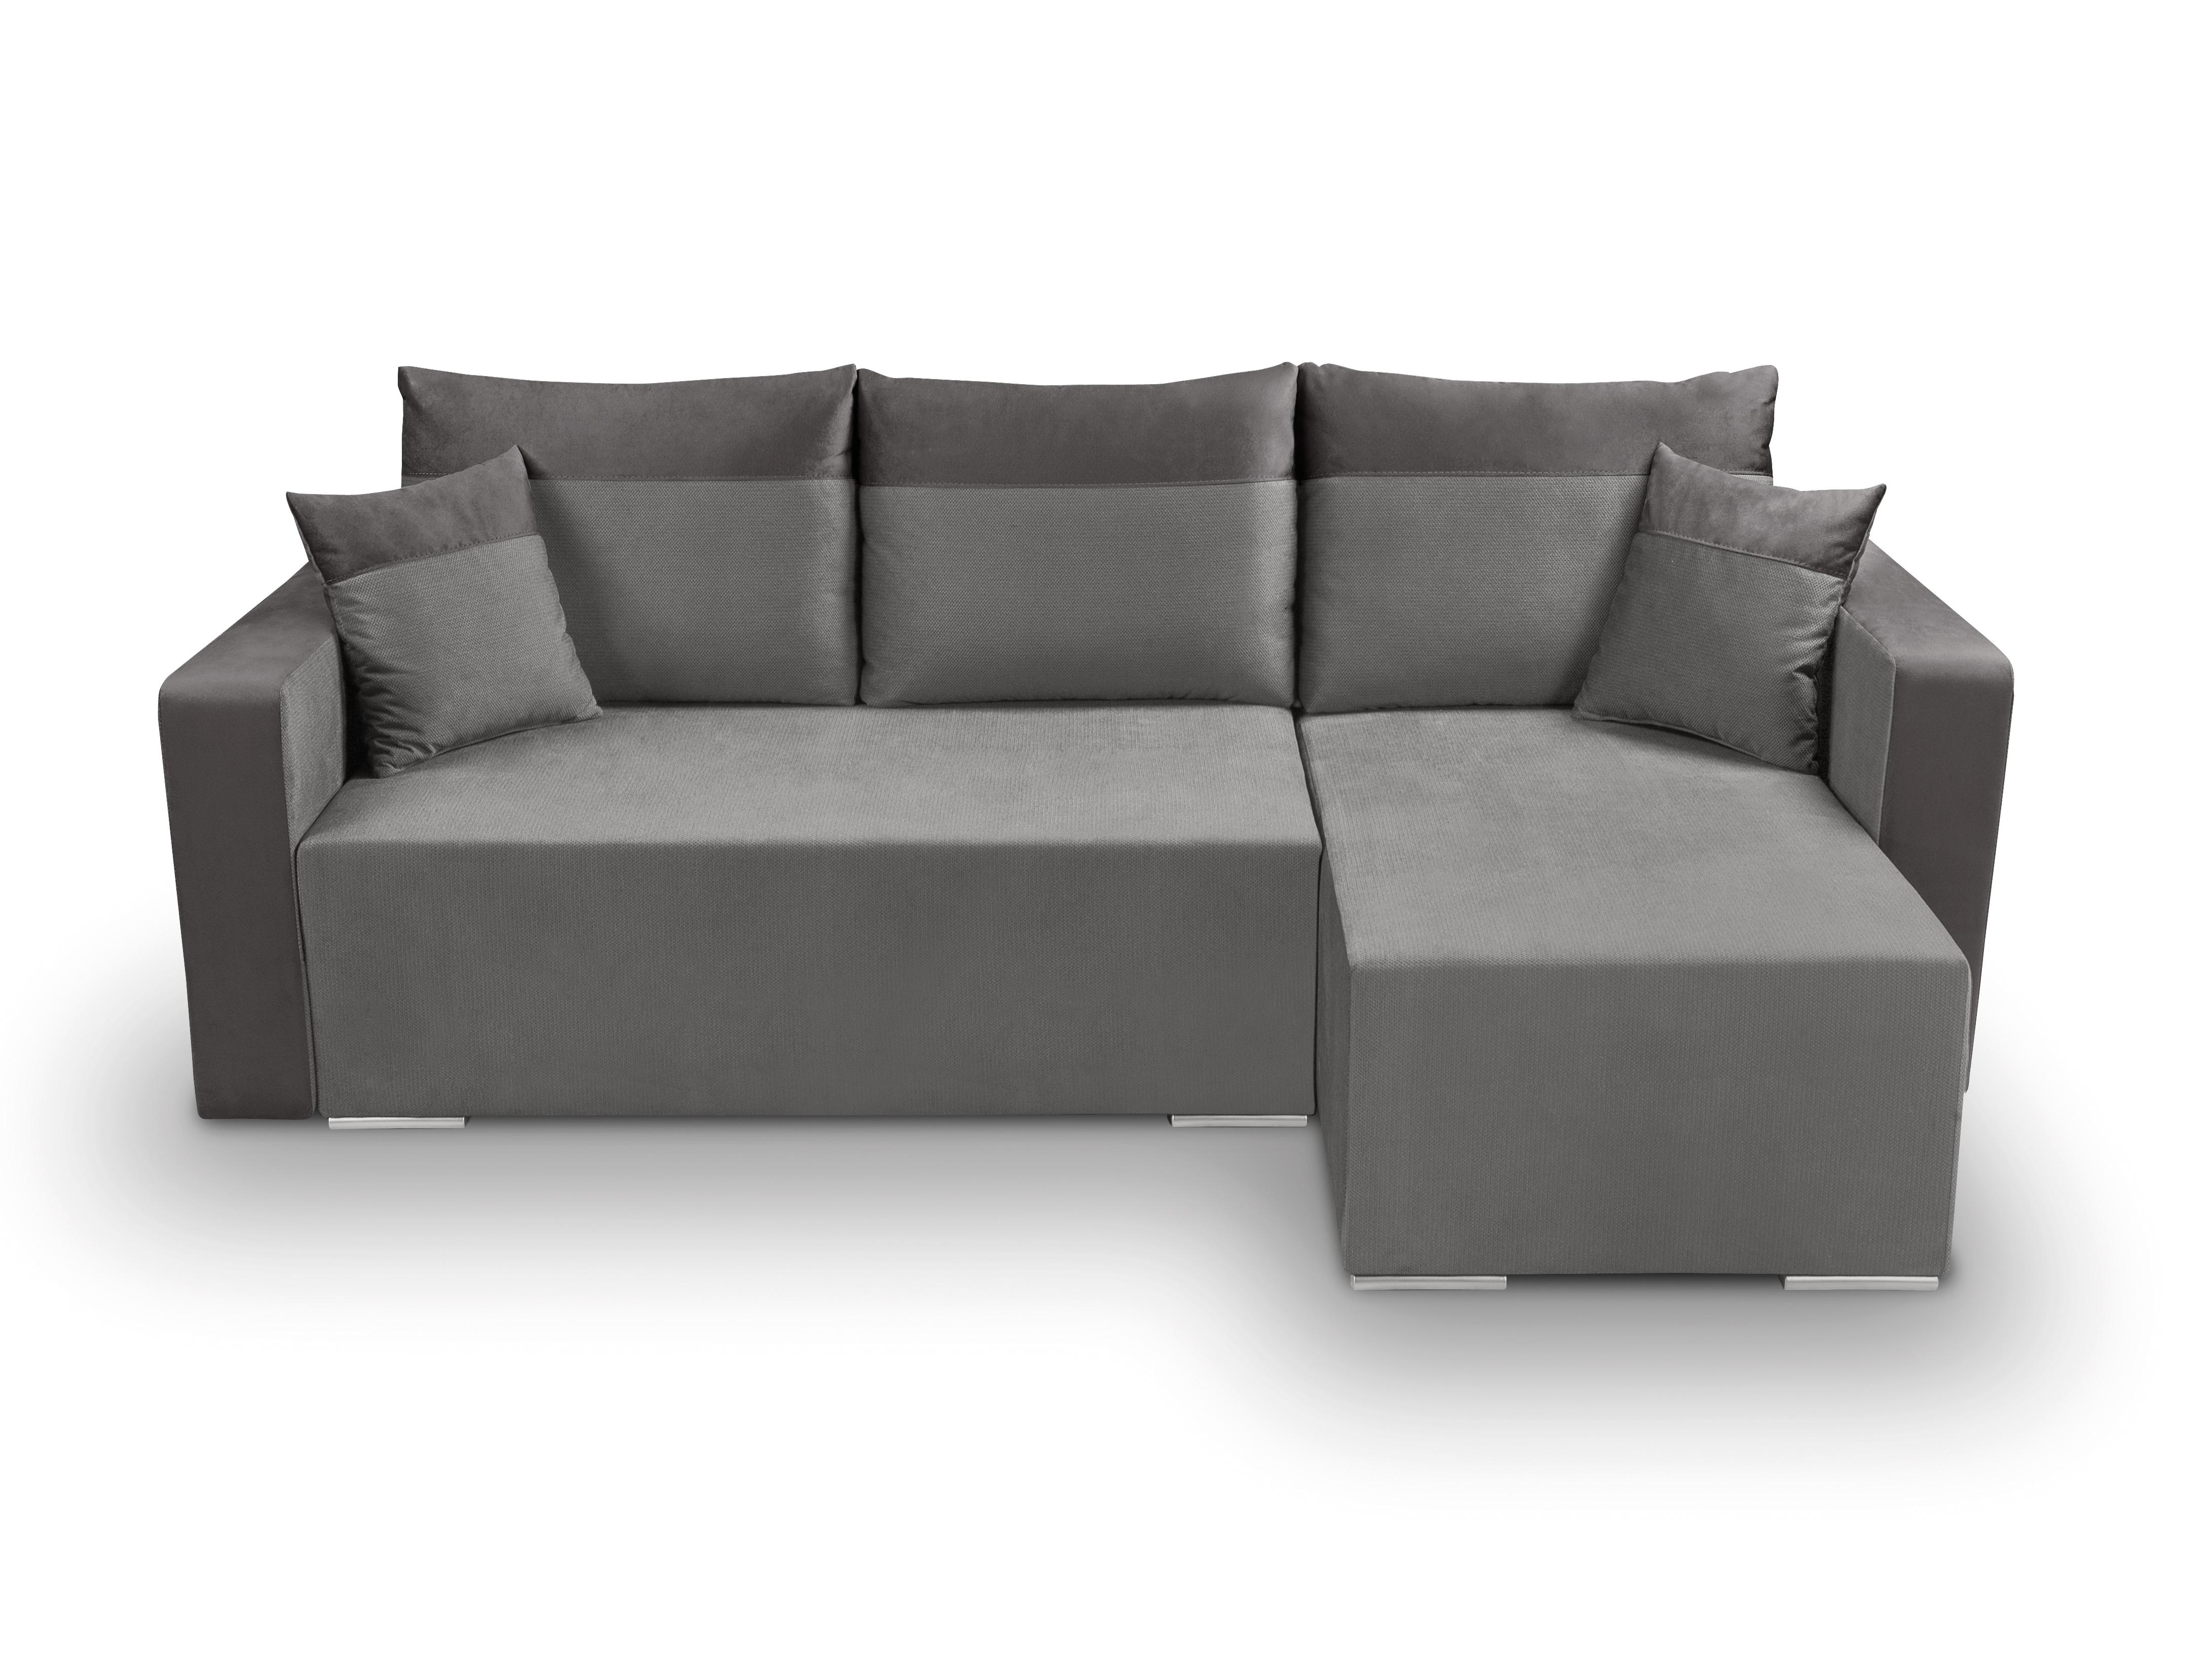 Rohová sedací souprava - BRW - Beti Lux 3DL.URC (šedá) (P)